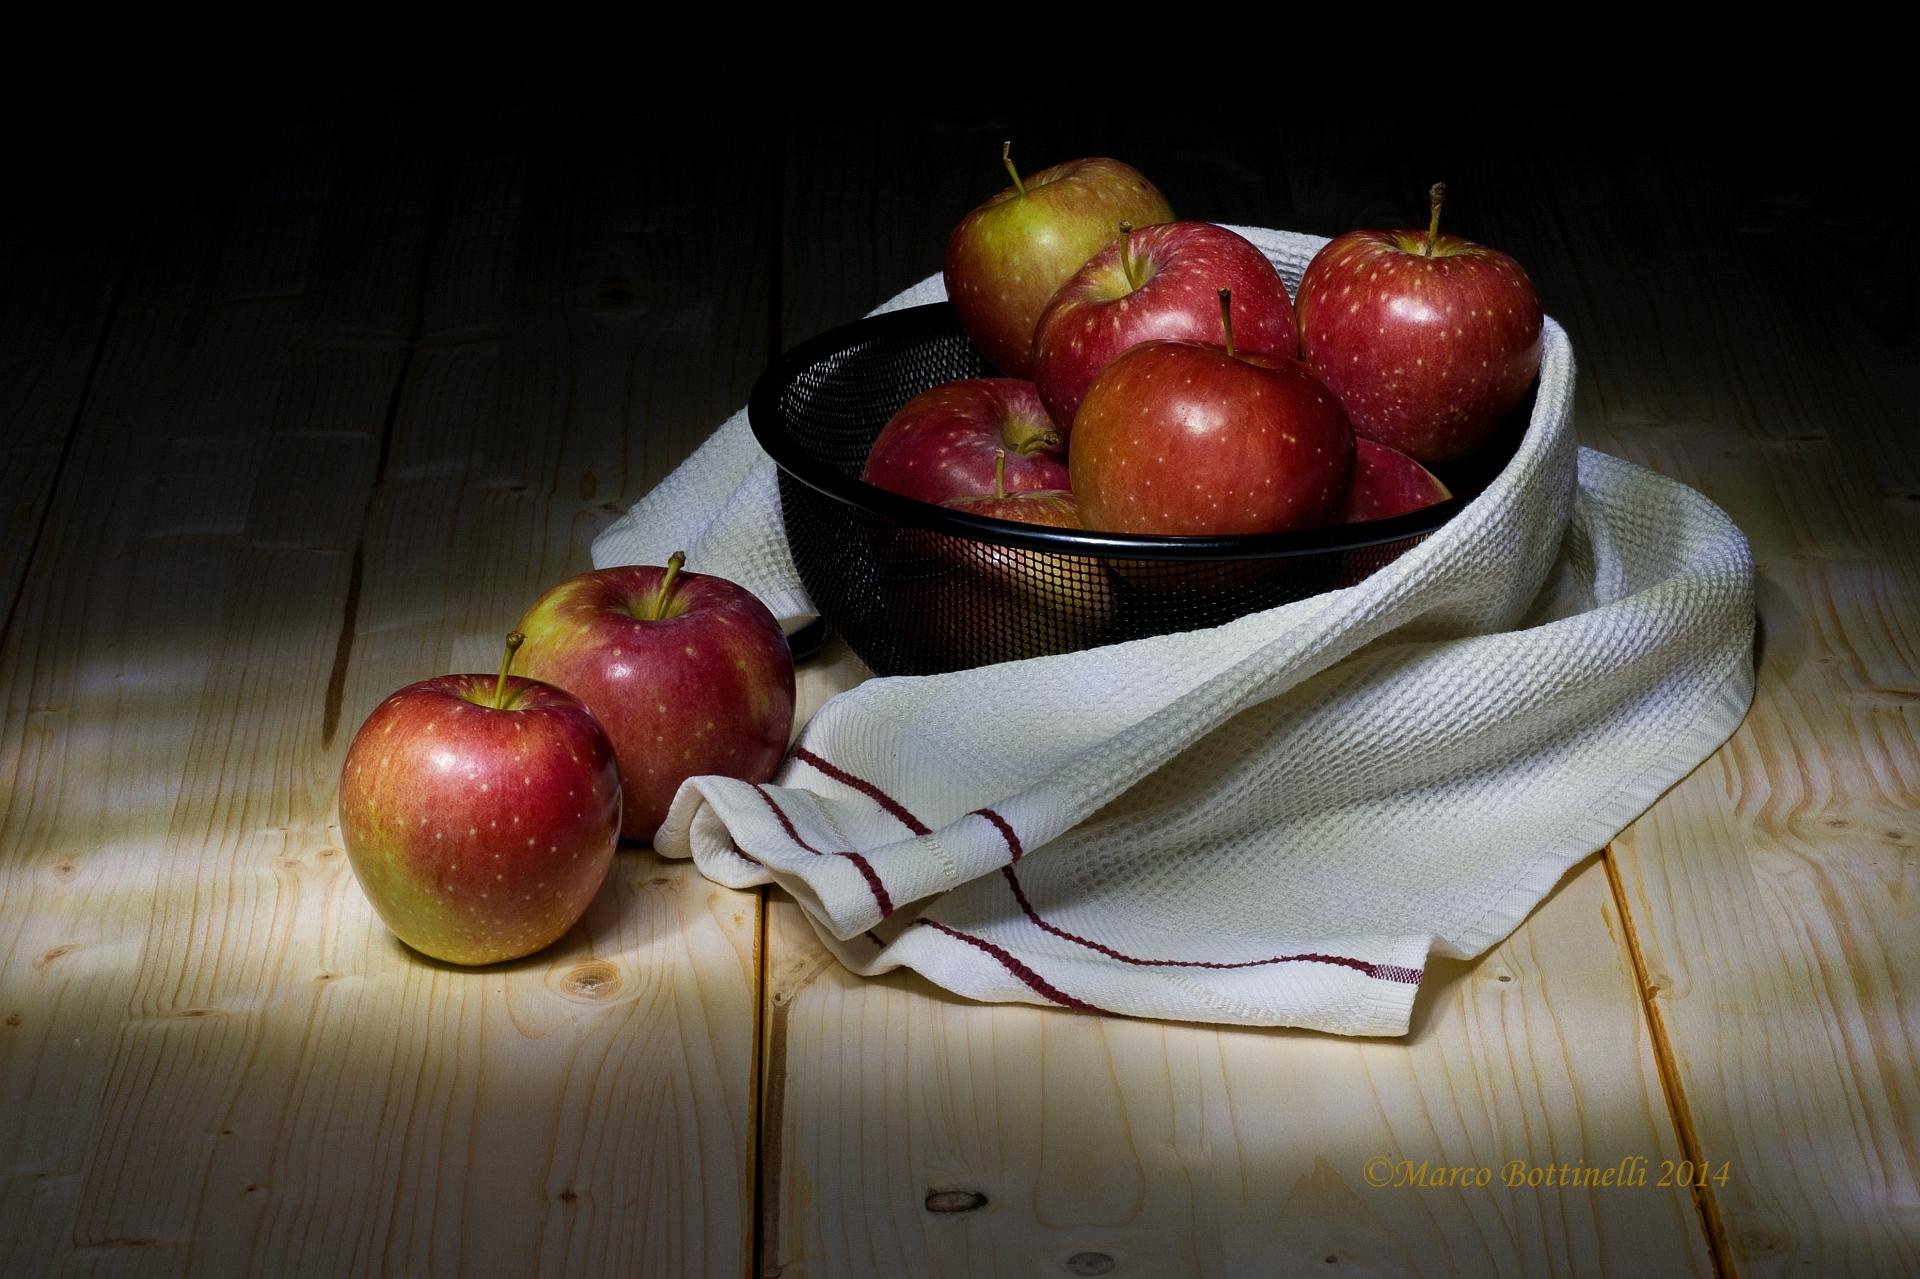 The Forbidden Fruit...